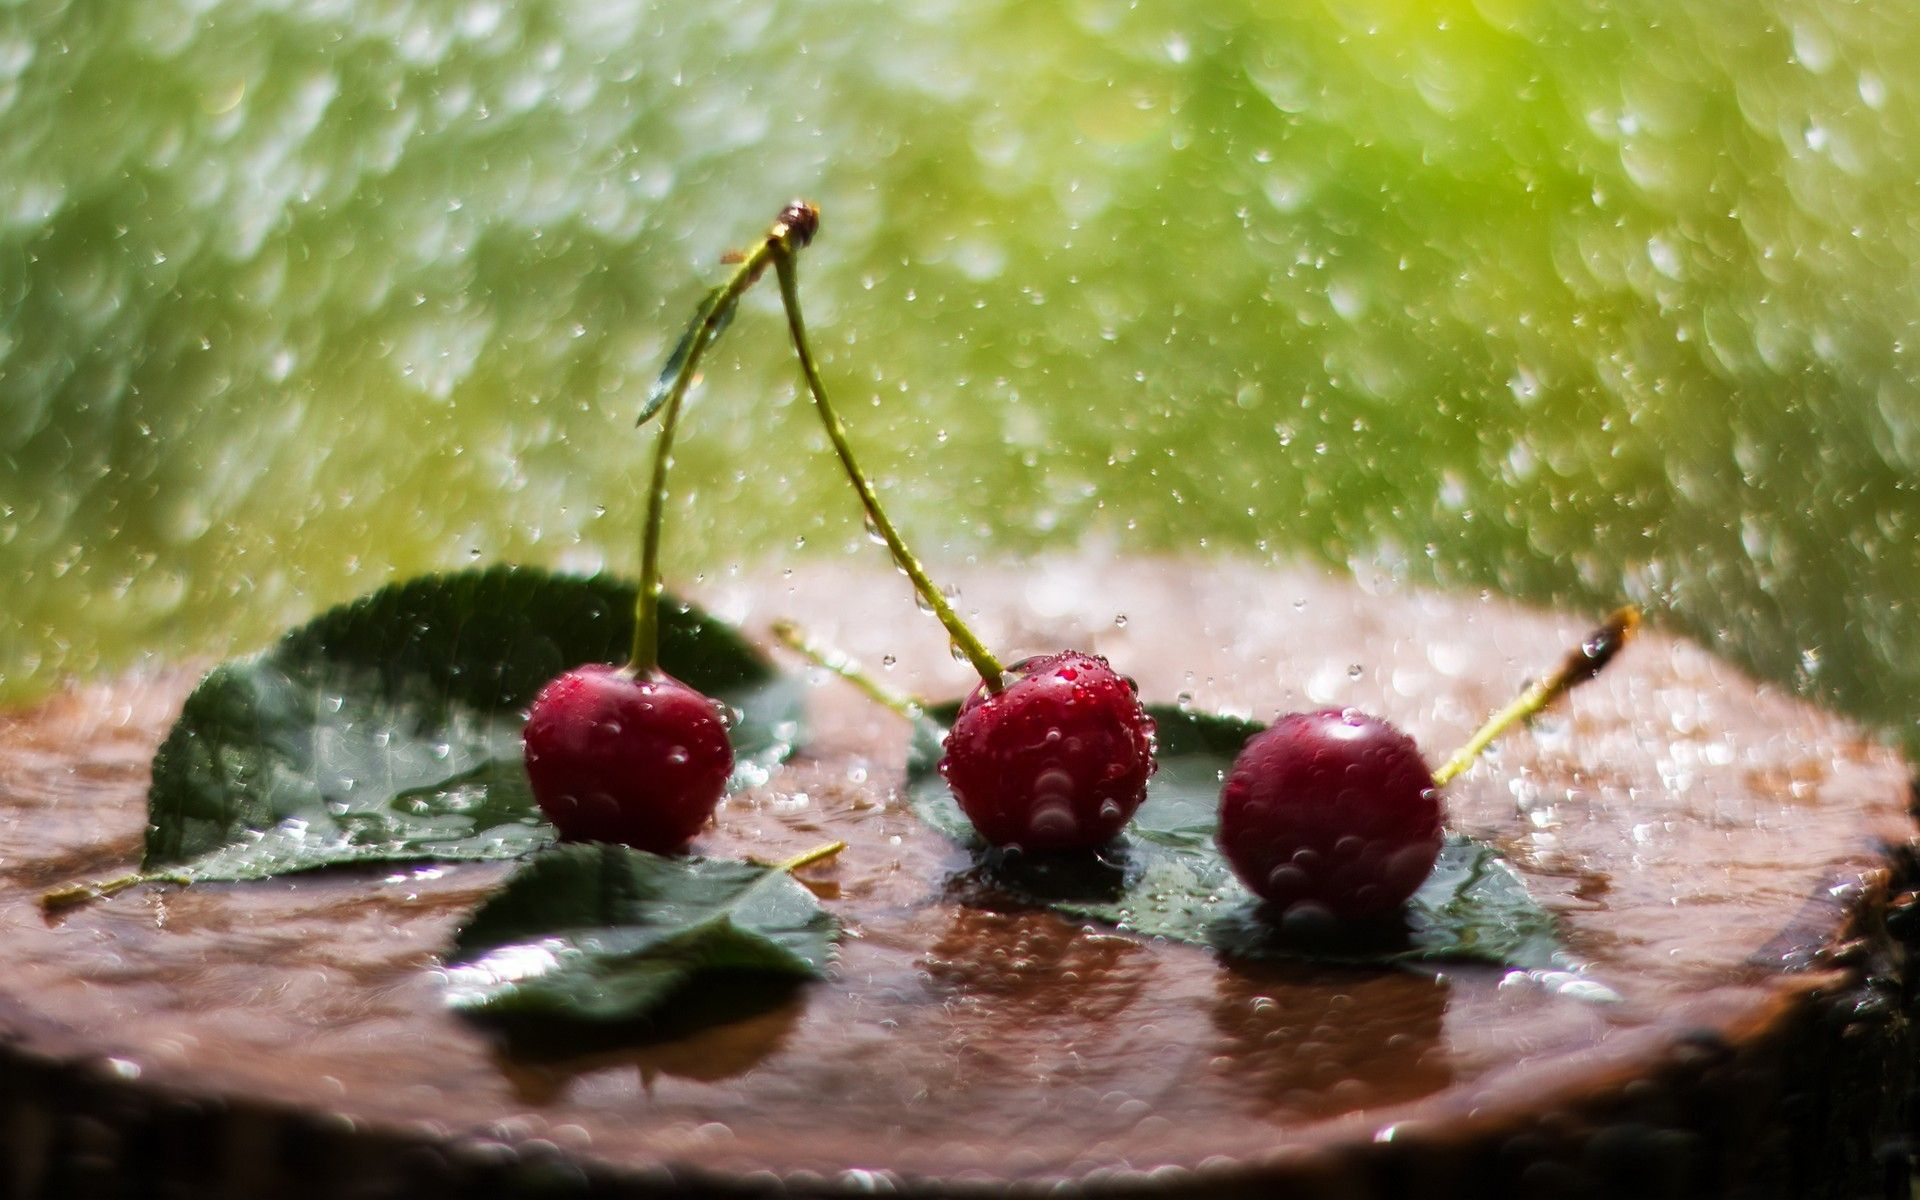 дома картинки на телефон лето дождь французских окон лучше